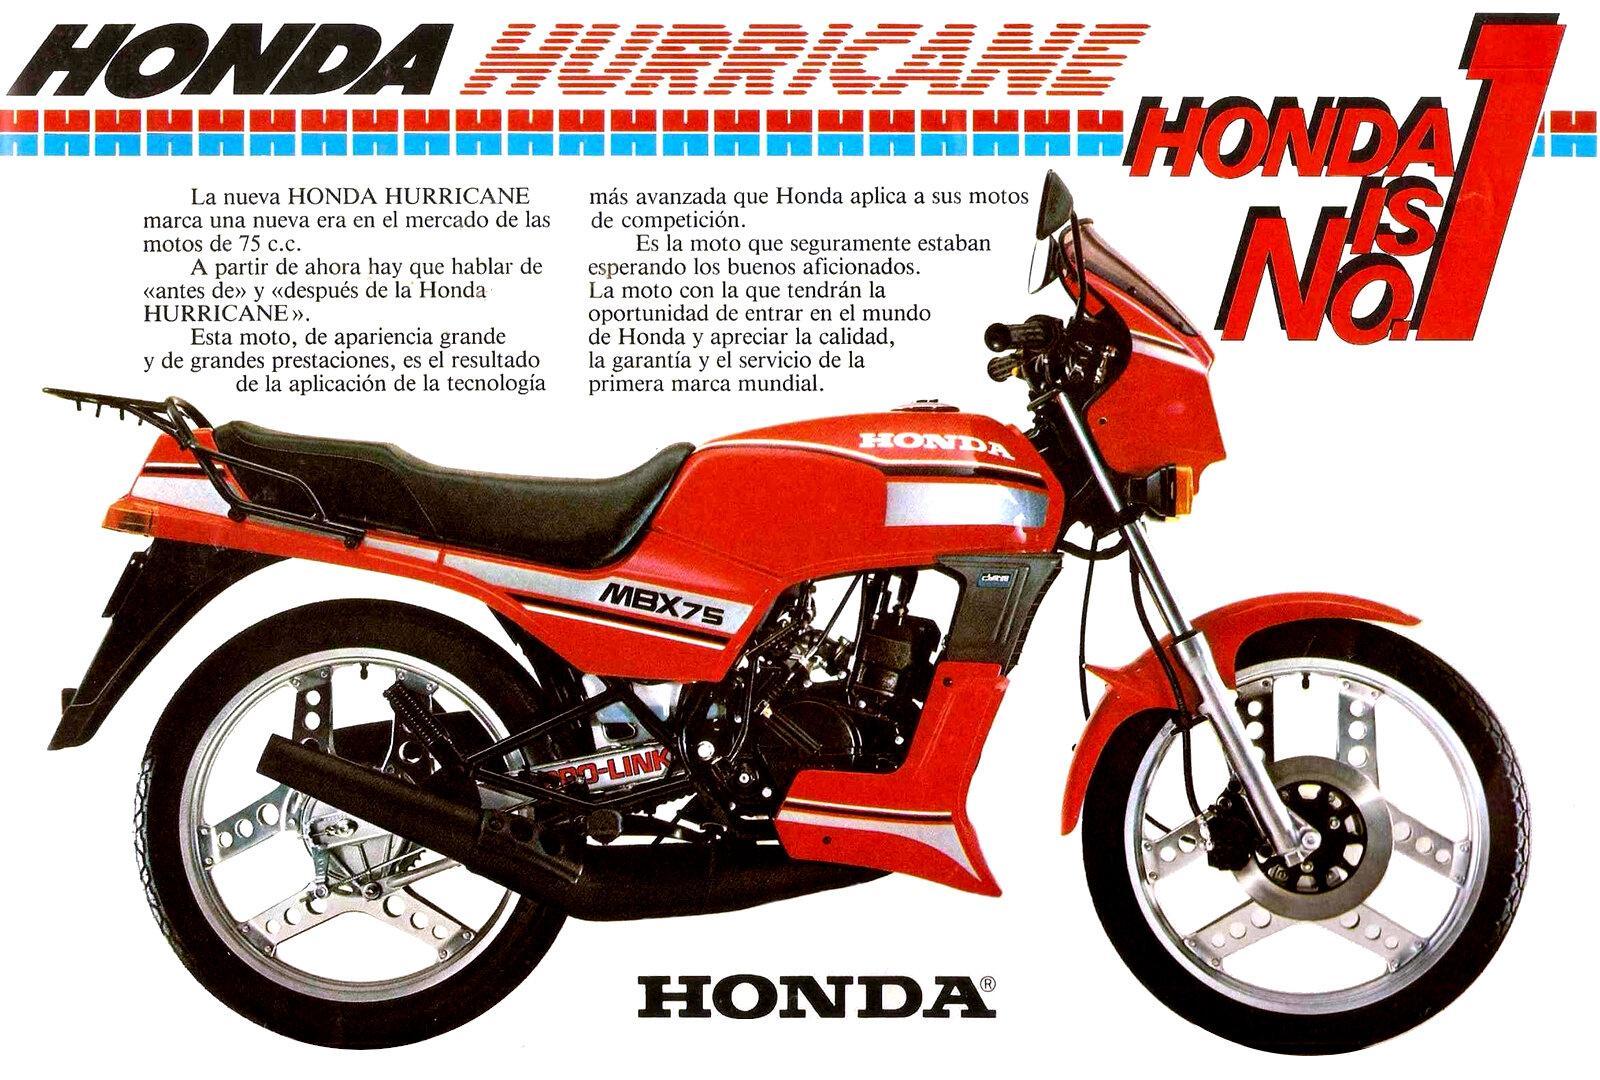 Honda MBX 75 Hurricane 2